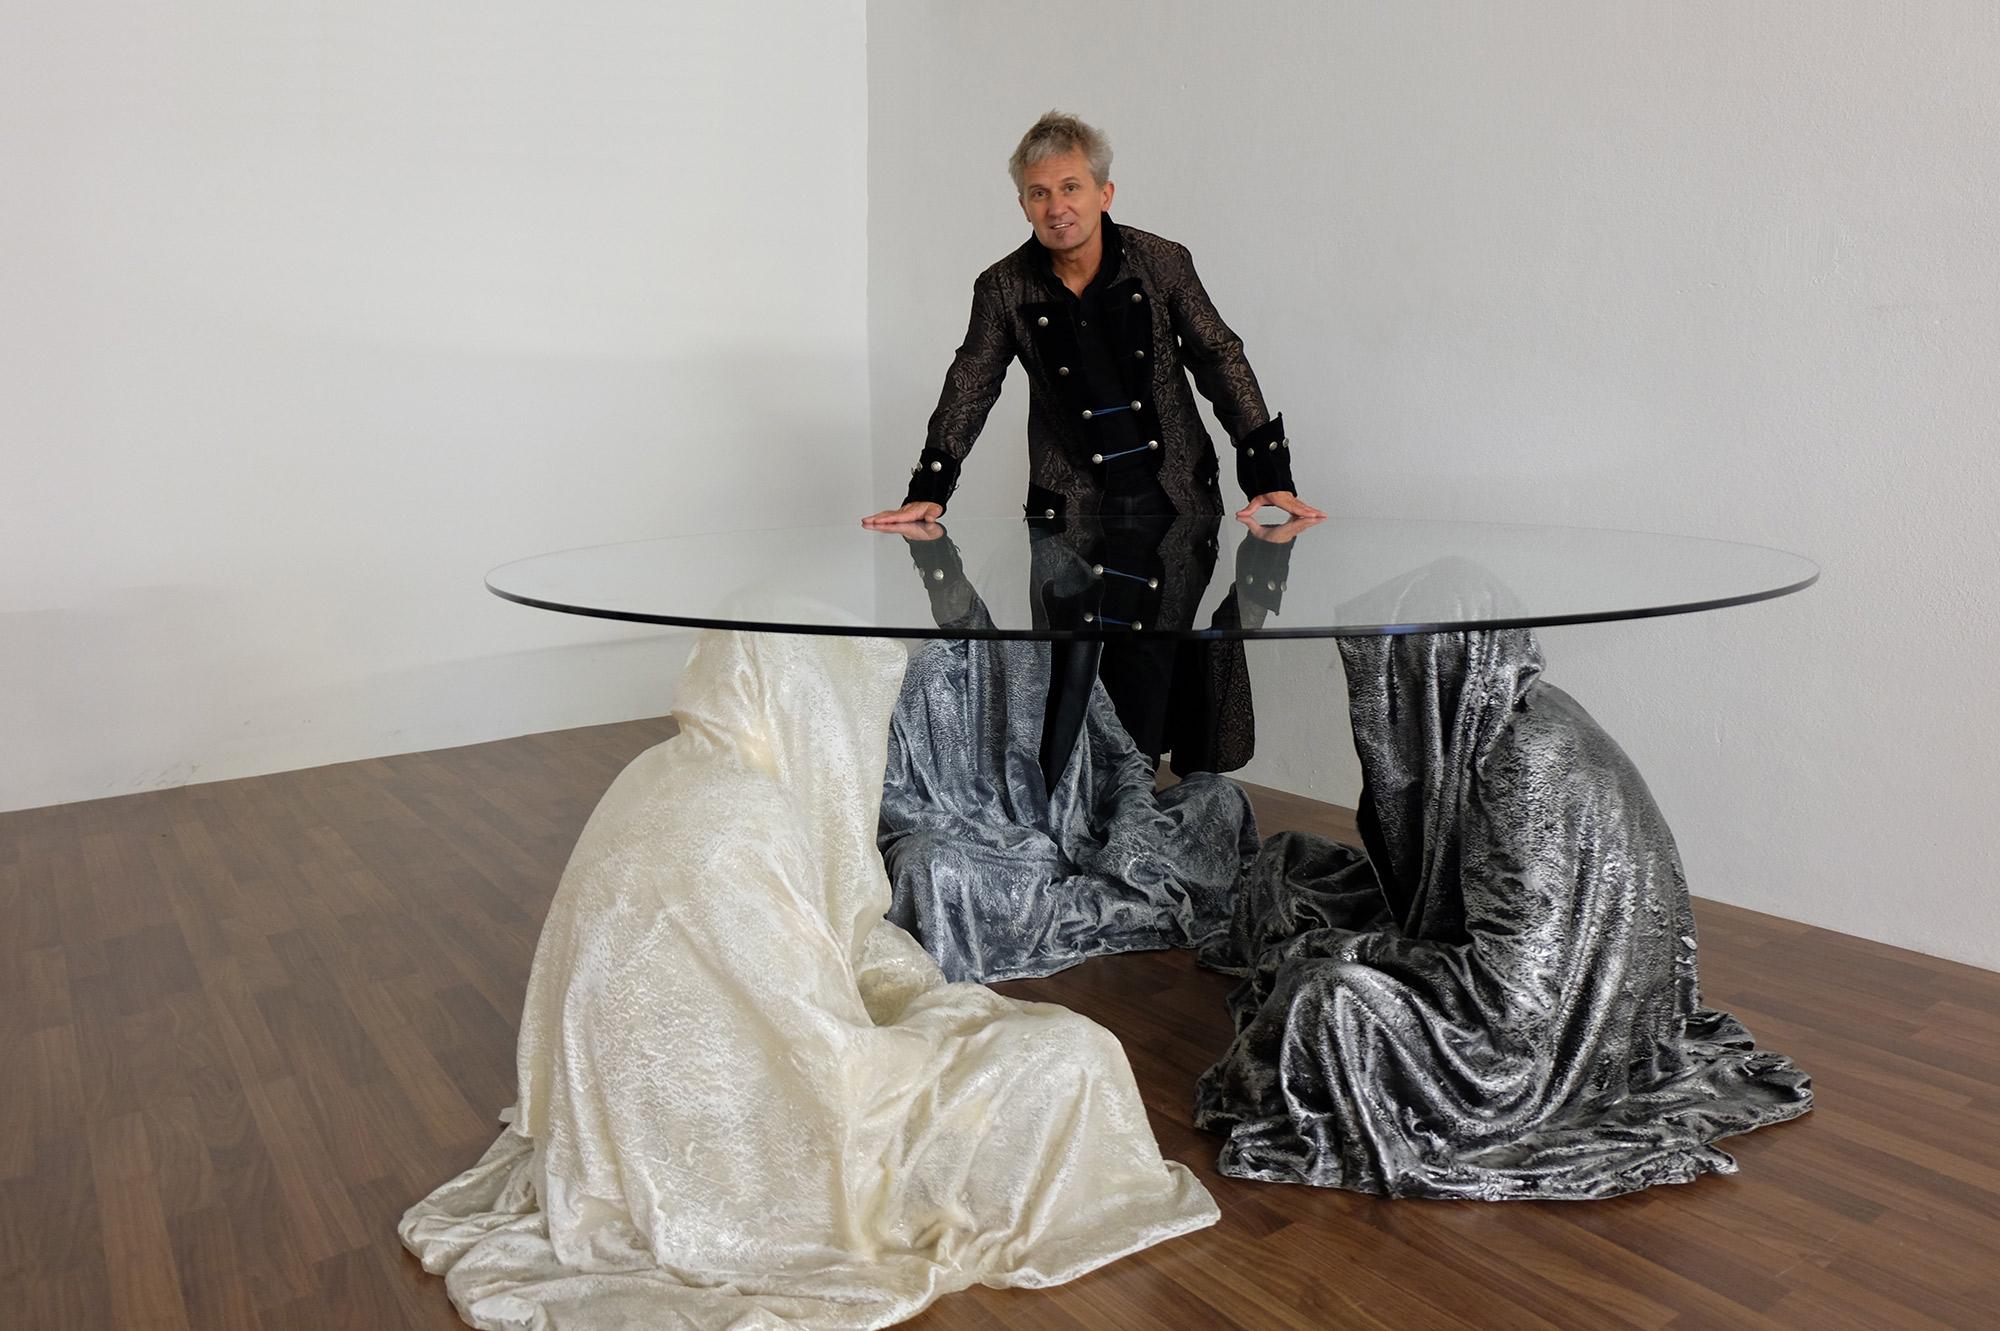 exclusive-furniture-guardian-table-glass-sculpture-statue-contemporary-light-art-design-antique-fine-art-manfred-kili-kielnhofer-4336y